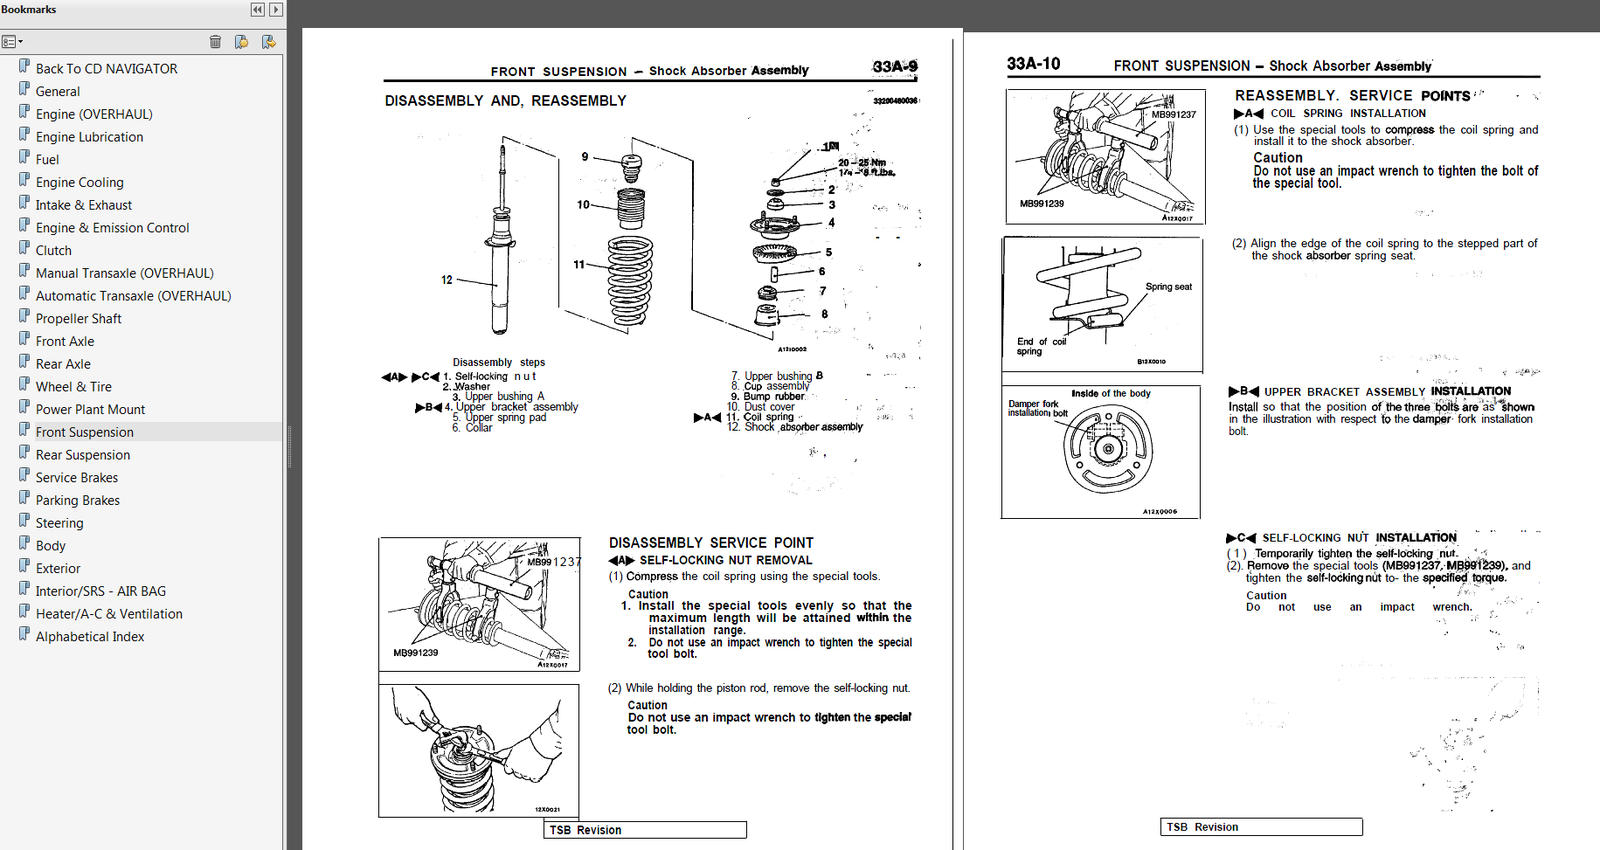 1997-1999 Mitsubishi Eclipse / Eclipse Spyder Service Manual